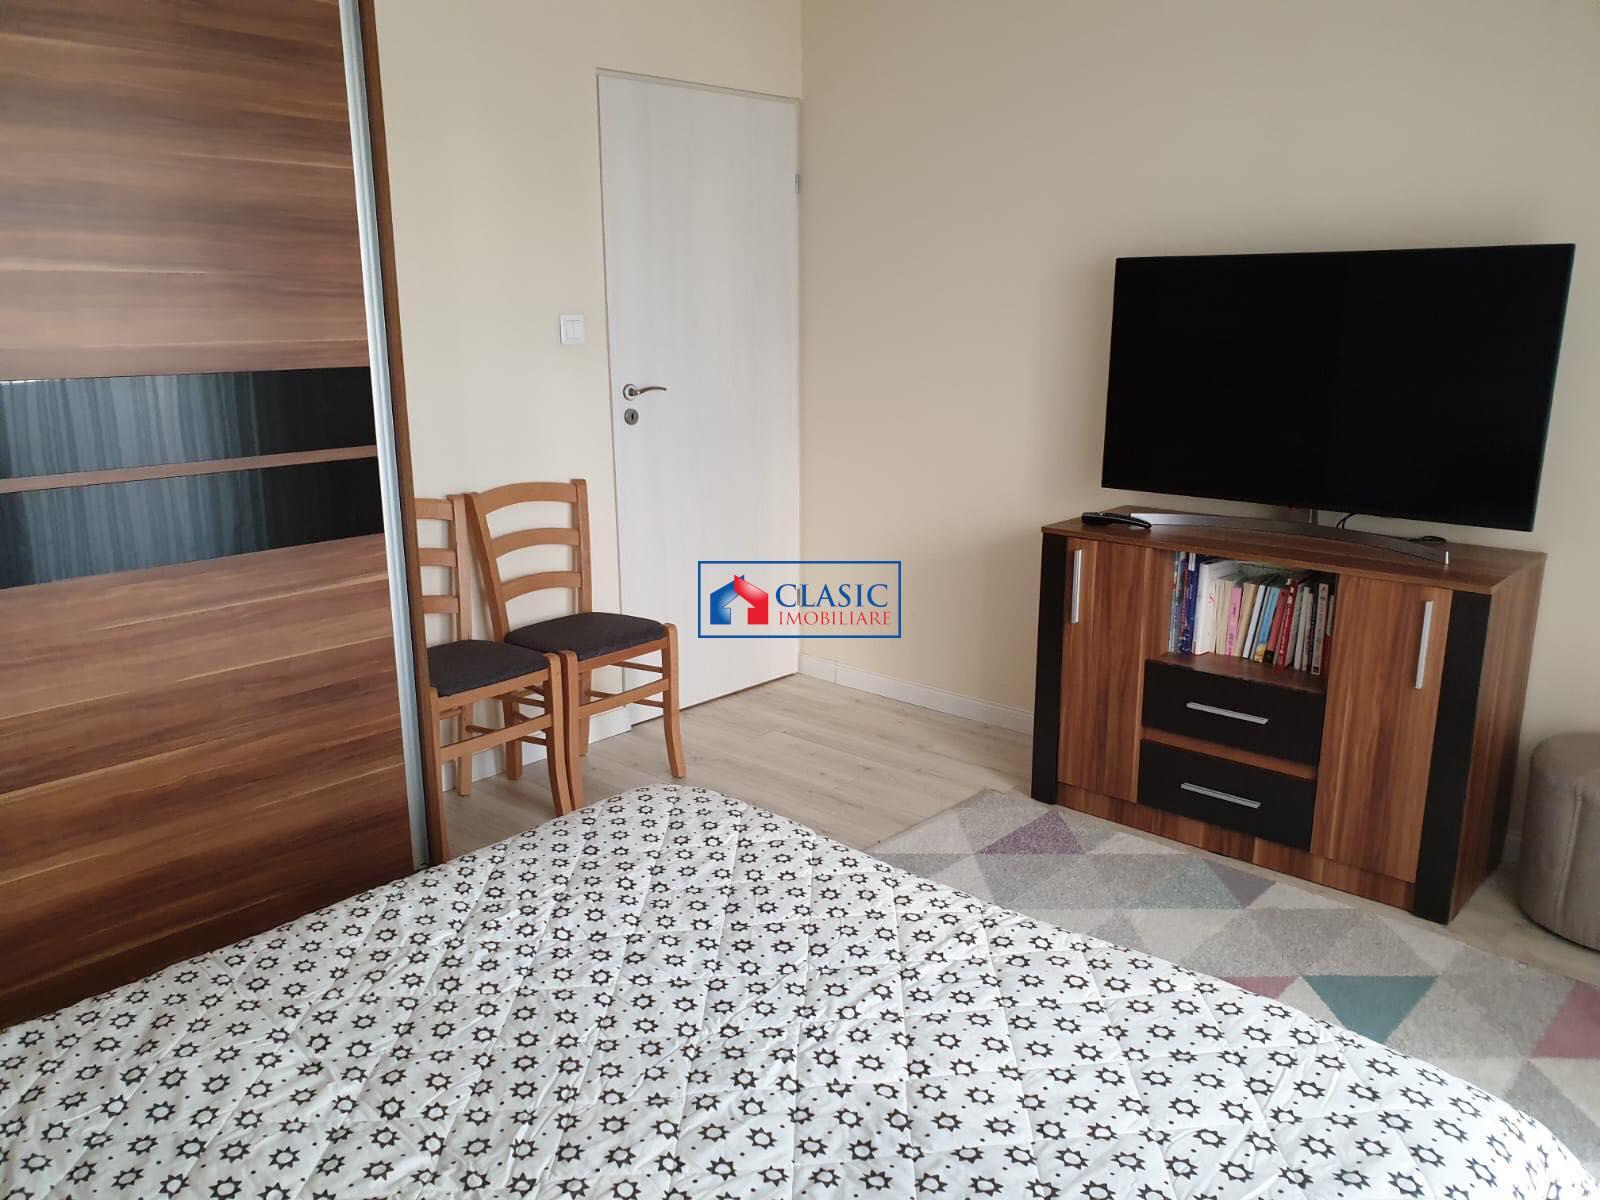 Vanzare apartament 3 camere modern in Manastur  str. Arinilor